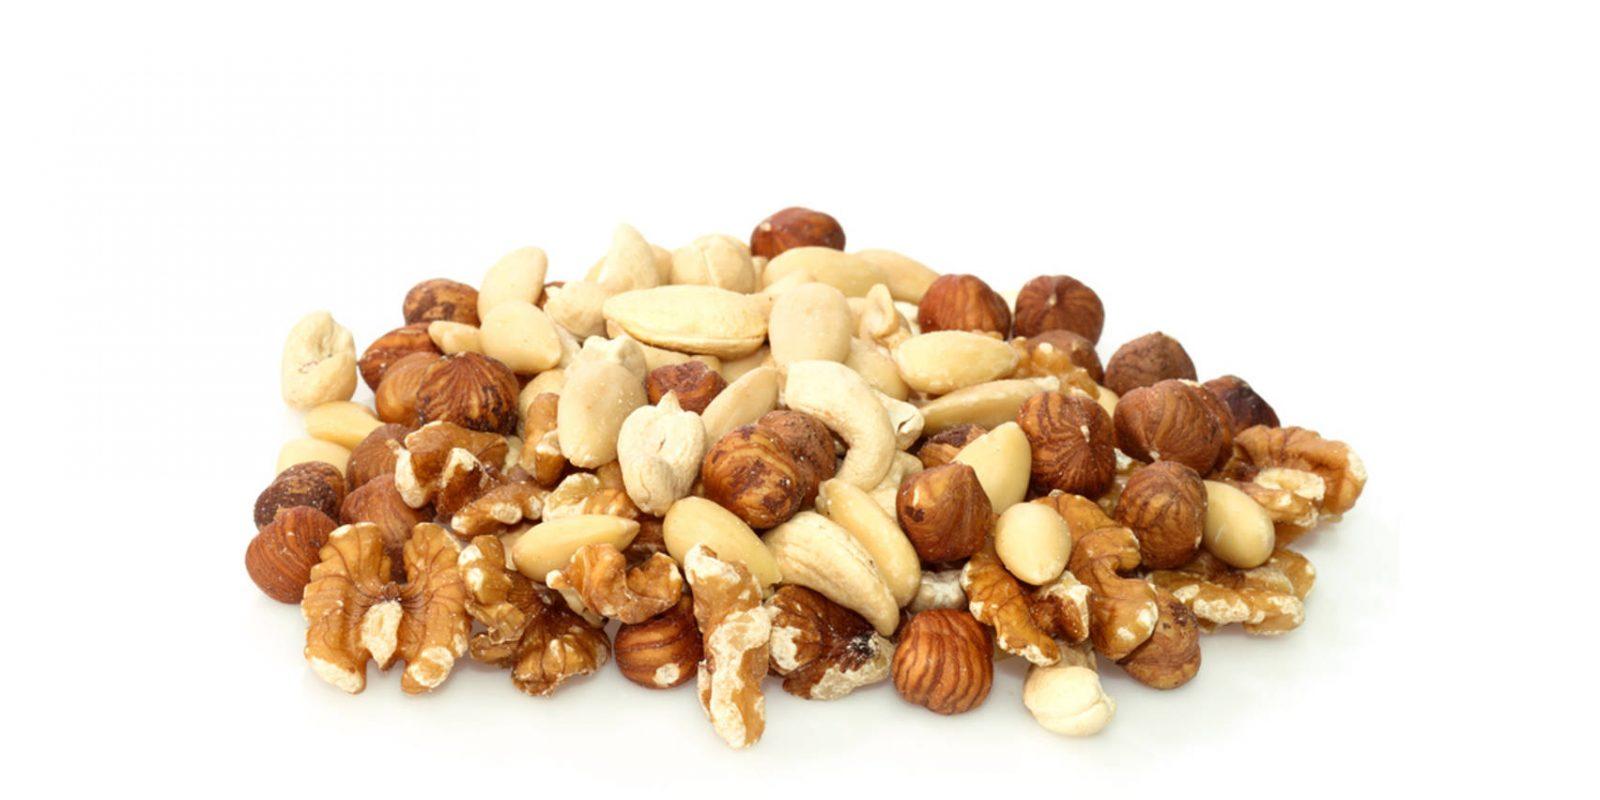 Nüsse: Gesunde Kalorienbomben